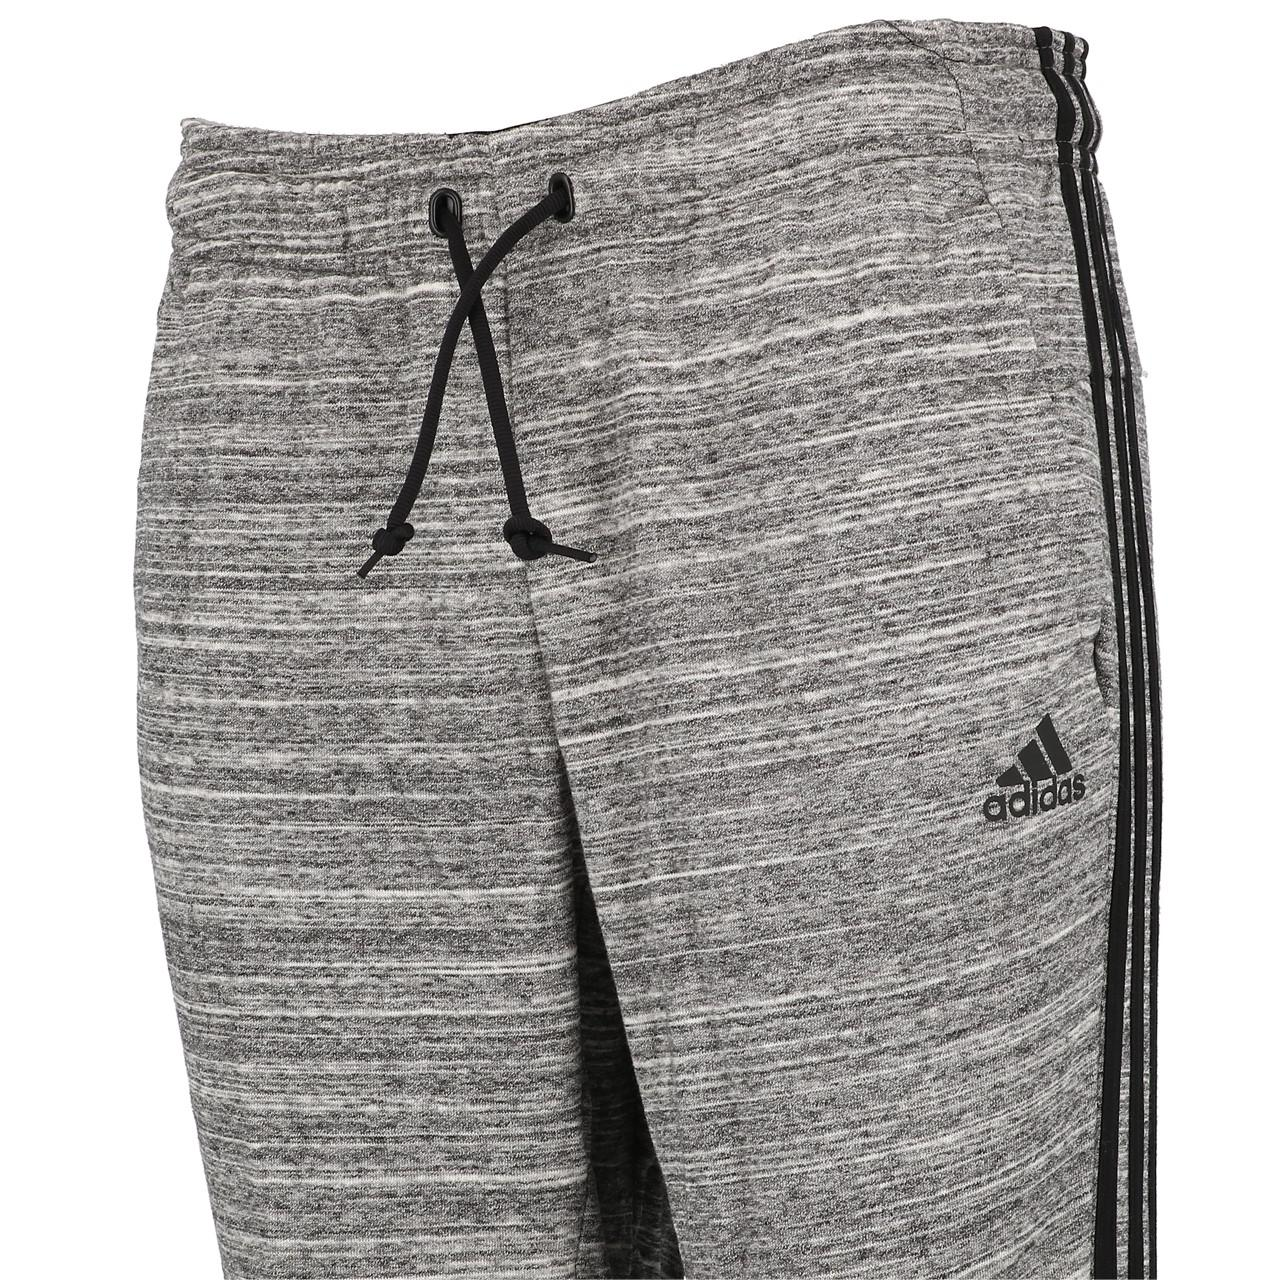 Trainingshose-Adidas-MH-Hth-Hose-Blk-Mel-L-Schwarz-18938-Neu Indexbild 3